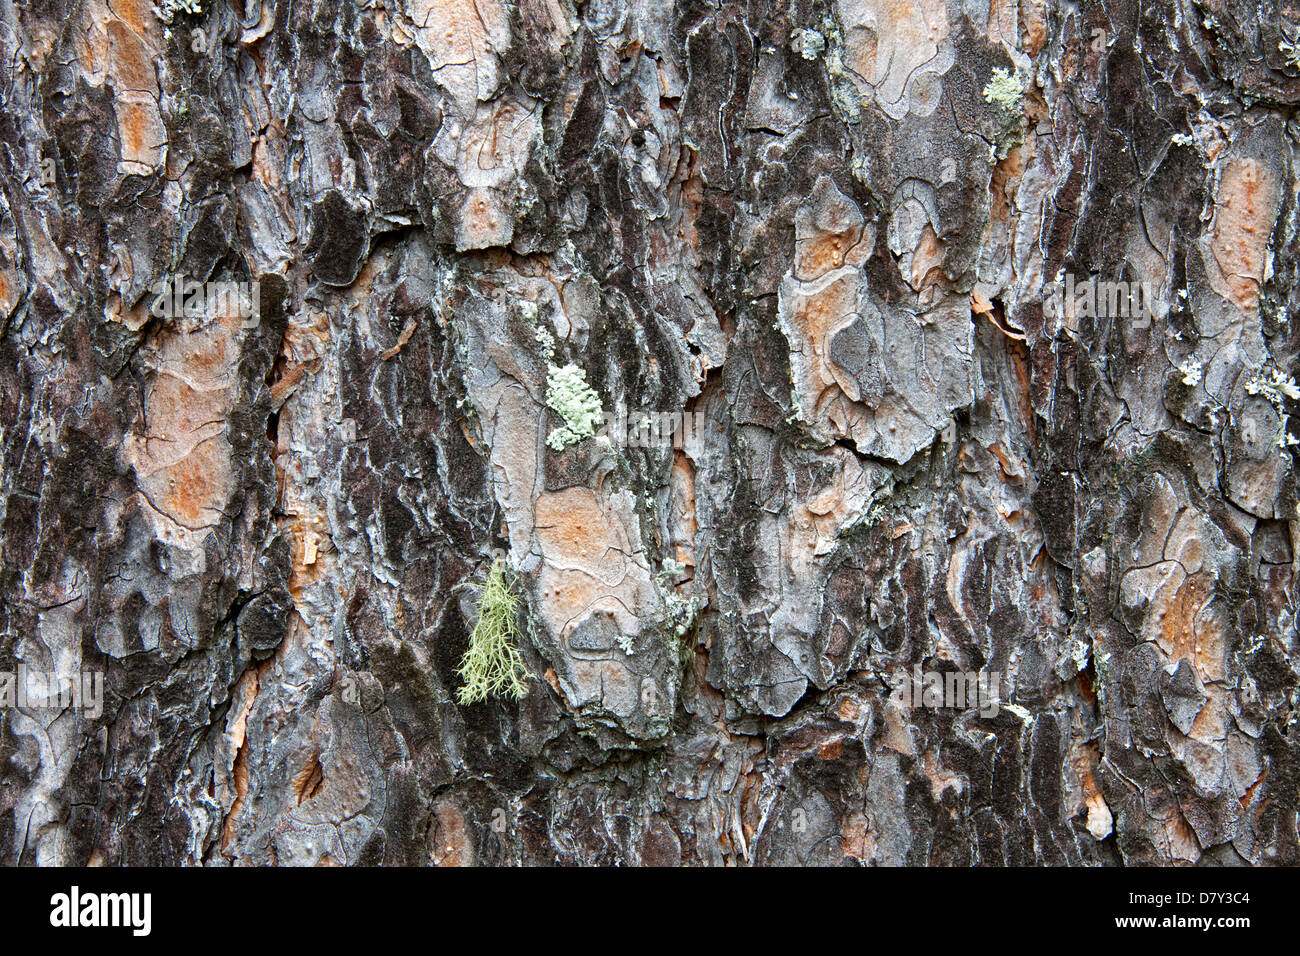 Scots pine bark (Pinus sylvestris) close-up - Stock Image